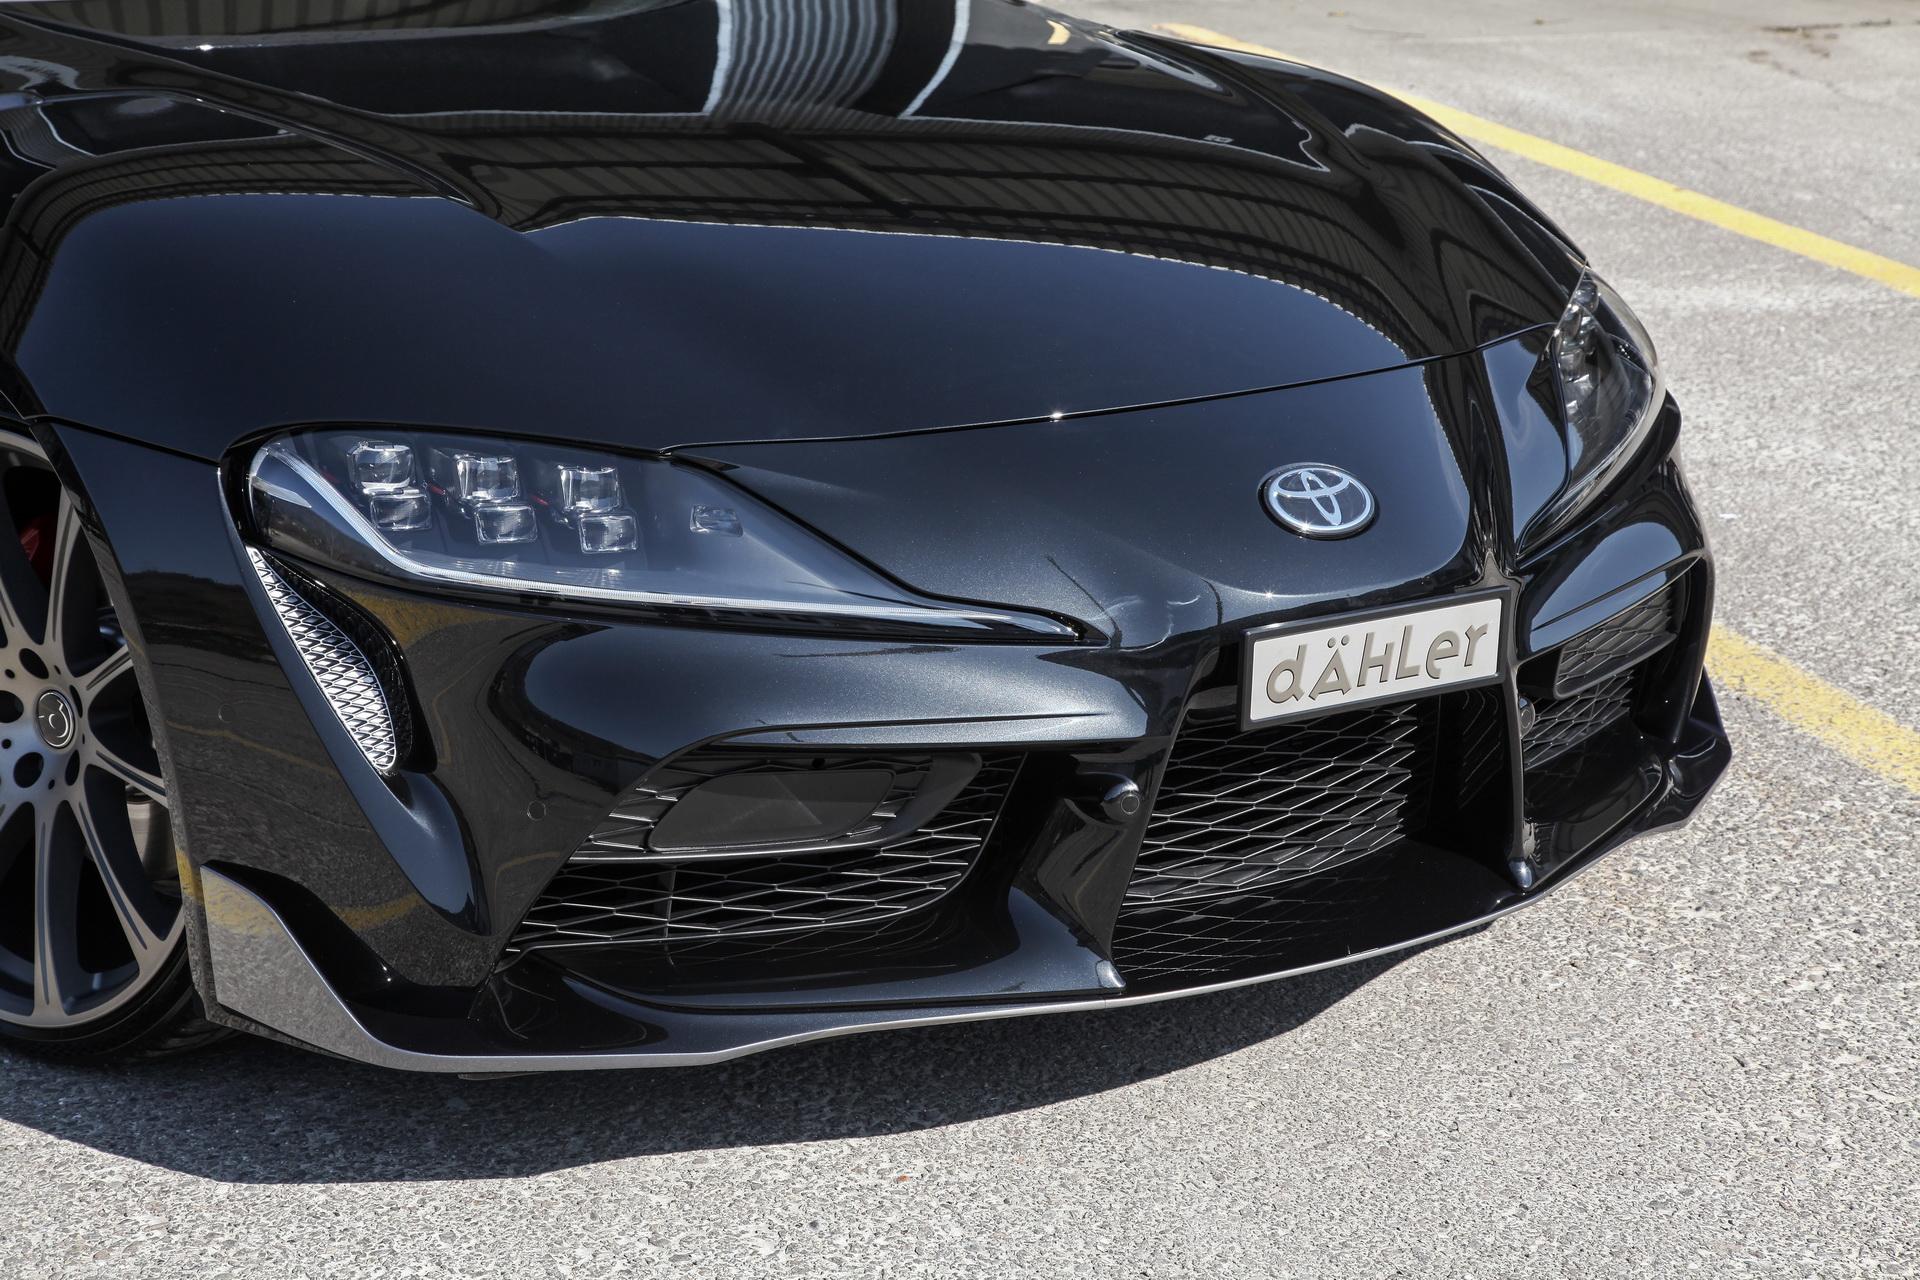 Toyota_Supra_by_Dahler_0002